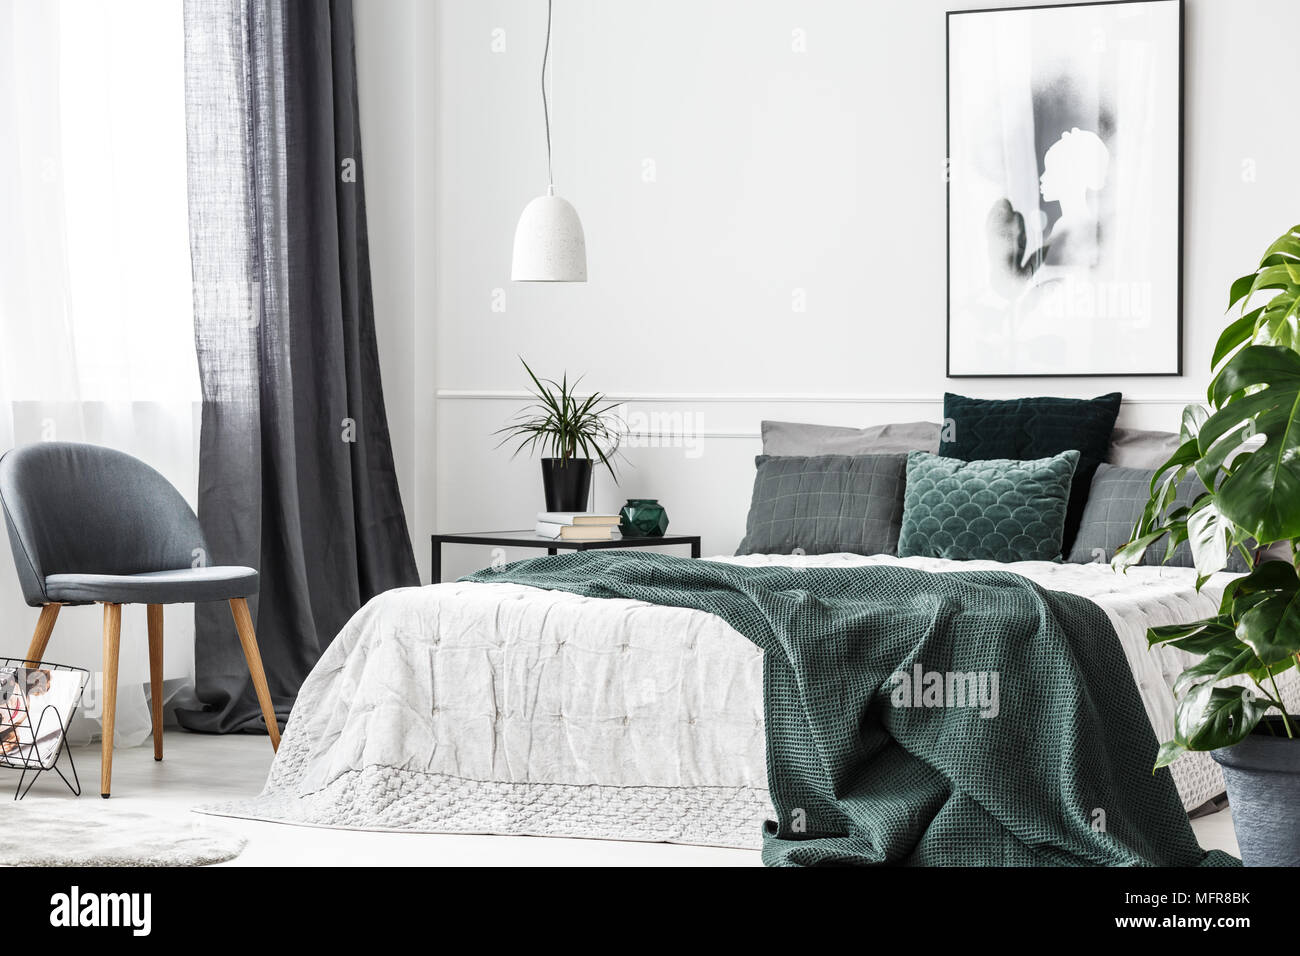 Bett Mit Kissen Bett Kissen Sonderanfertigung Patchwork Kissen